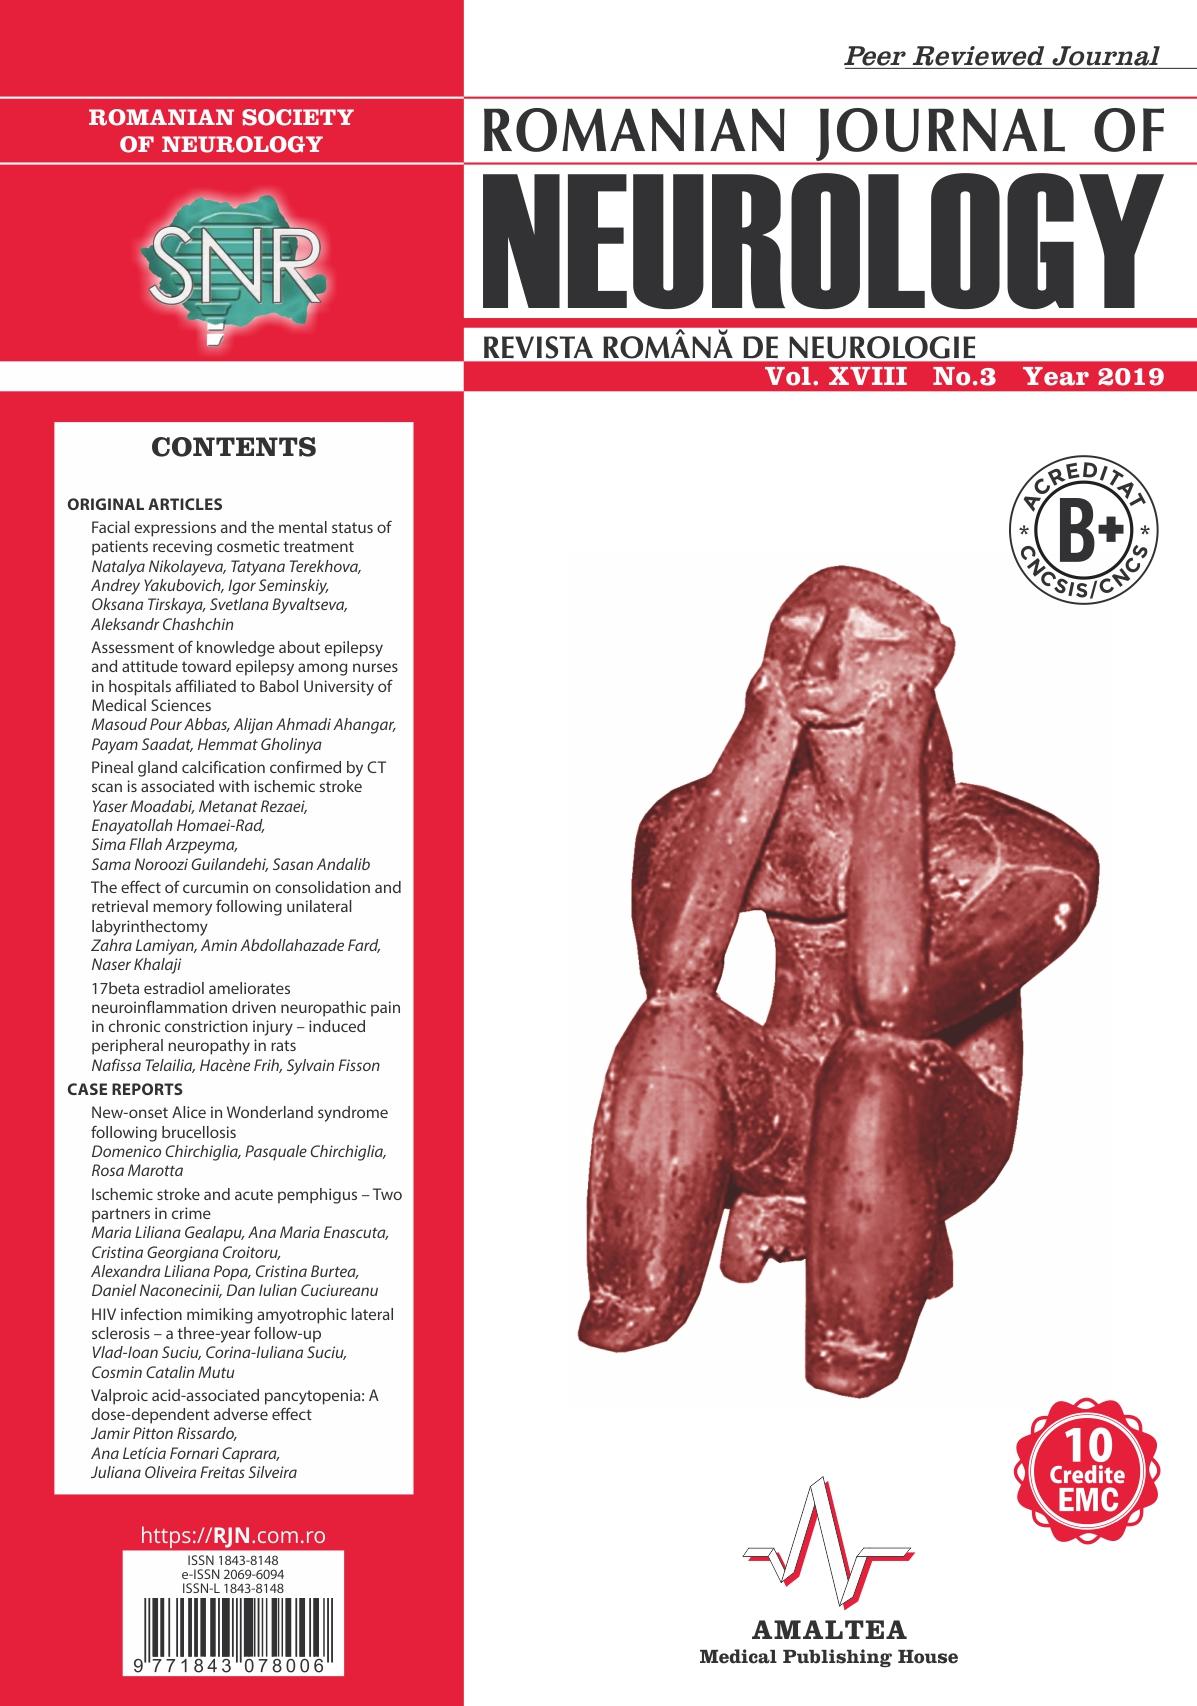 Romanian Journal of Neurology, Volume XVIII, No. 3, 2019